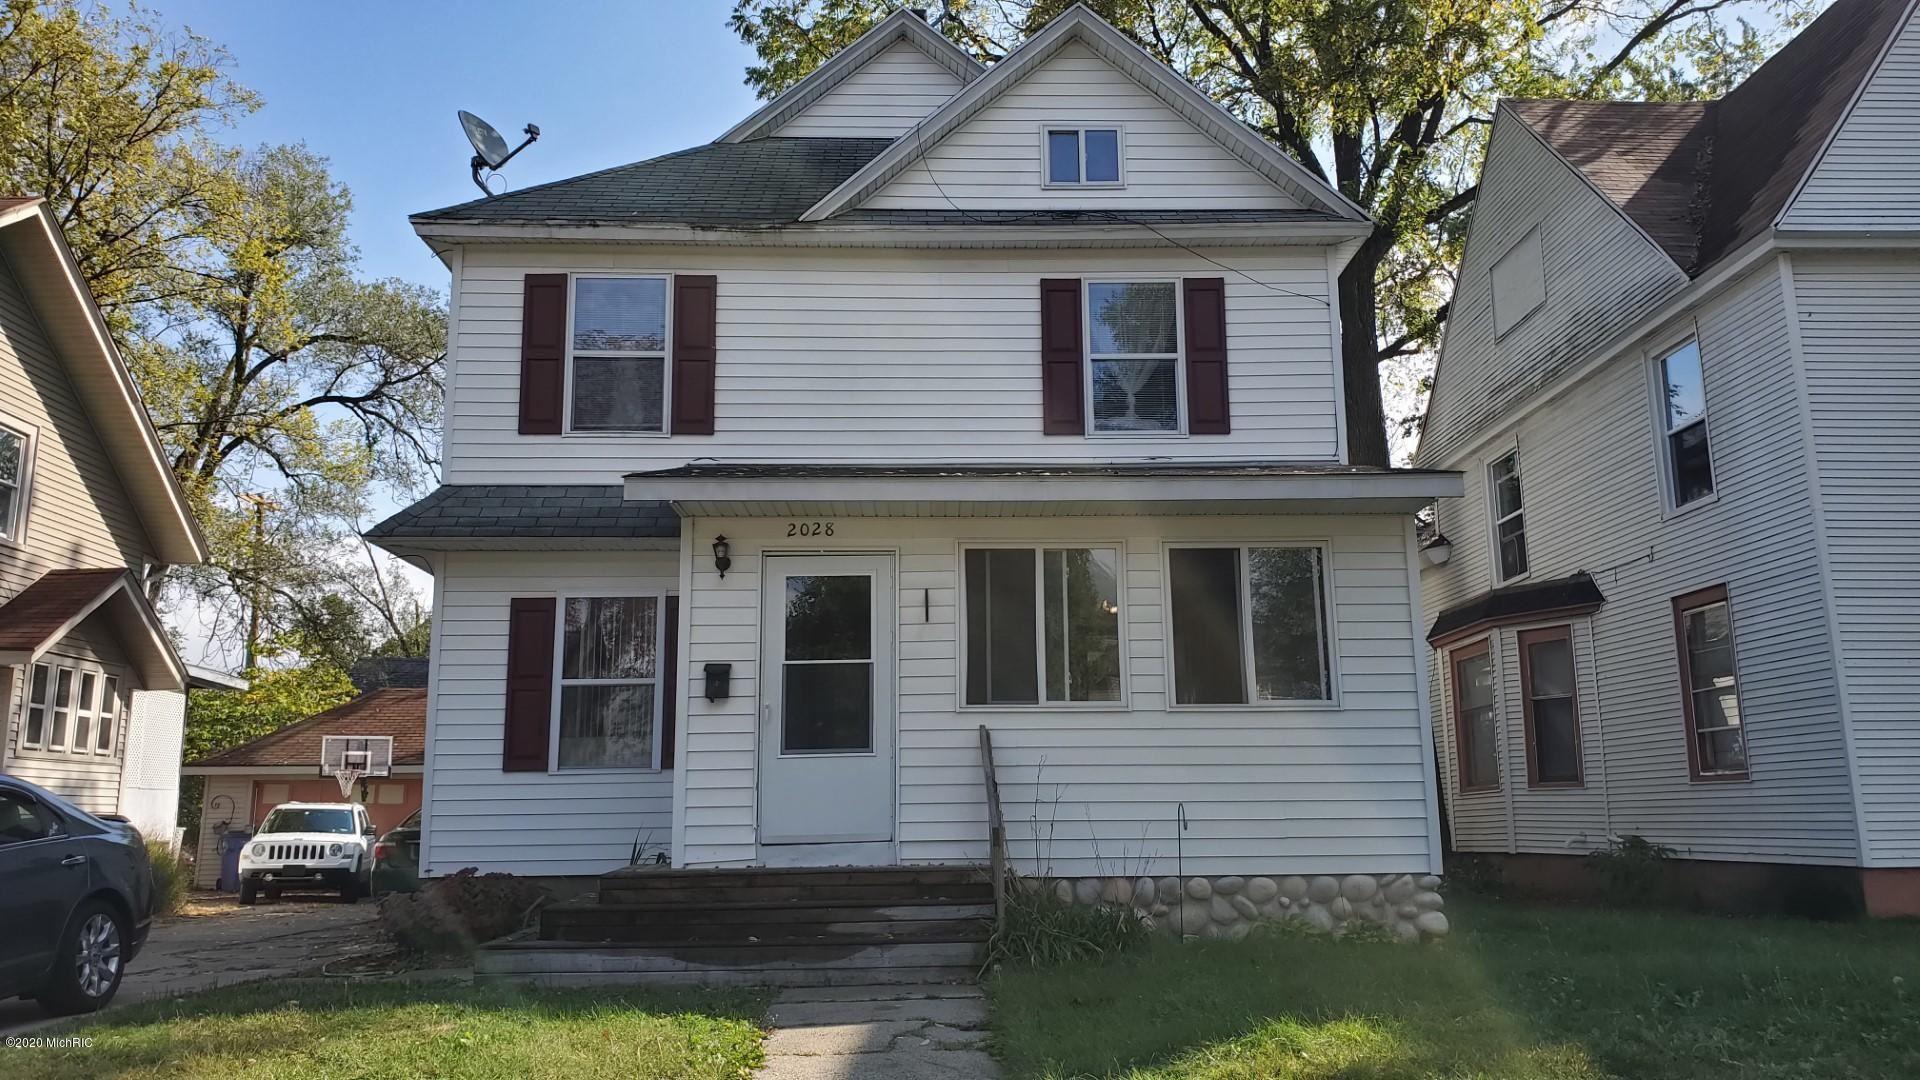 2028 Horton Avenue SE, Grand Rapids, MI 49507 - MLS#: 20041142